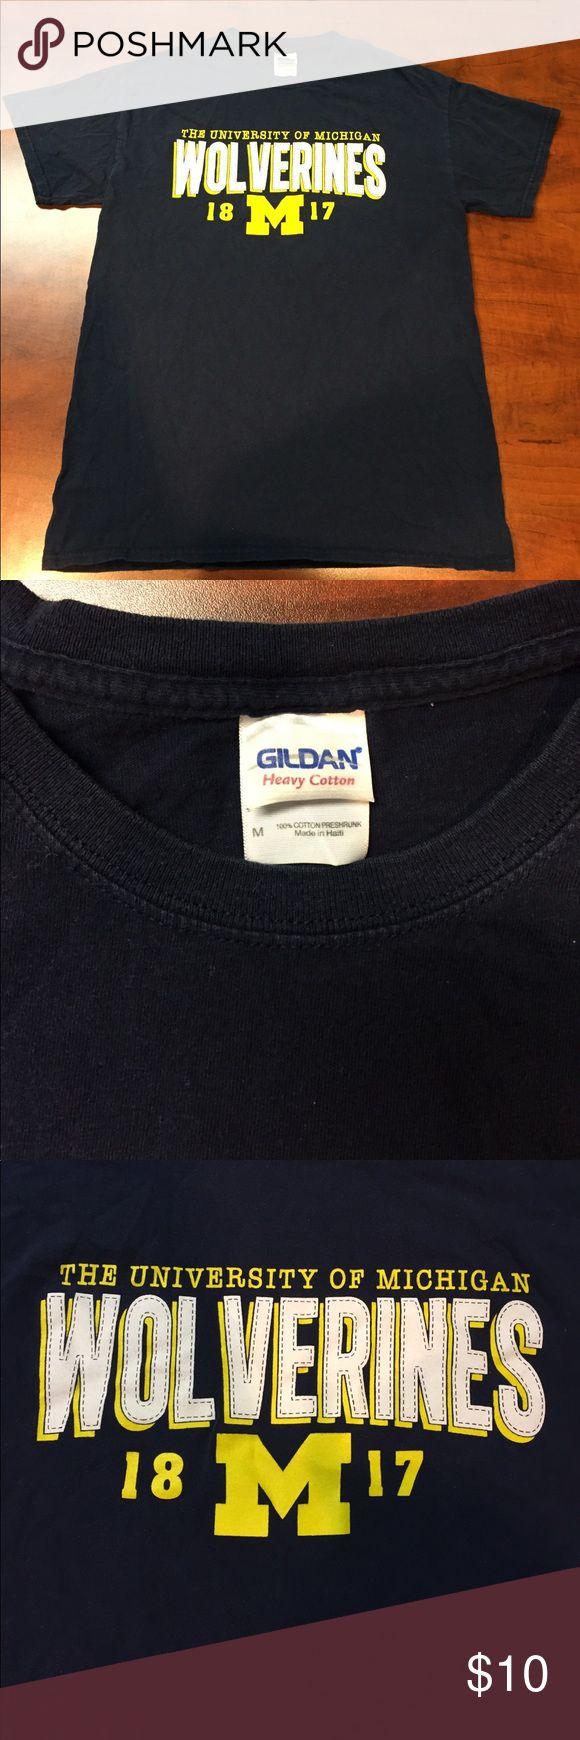 Black t shirts hollister - Wolverines T Shirt